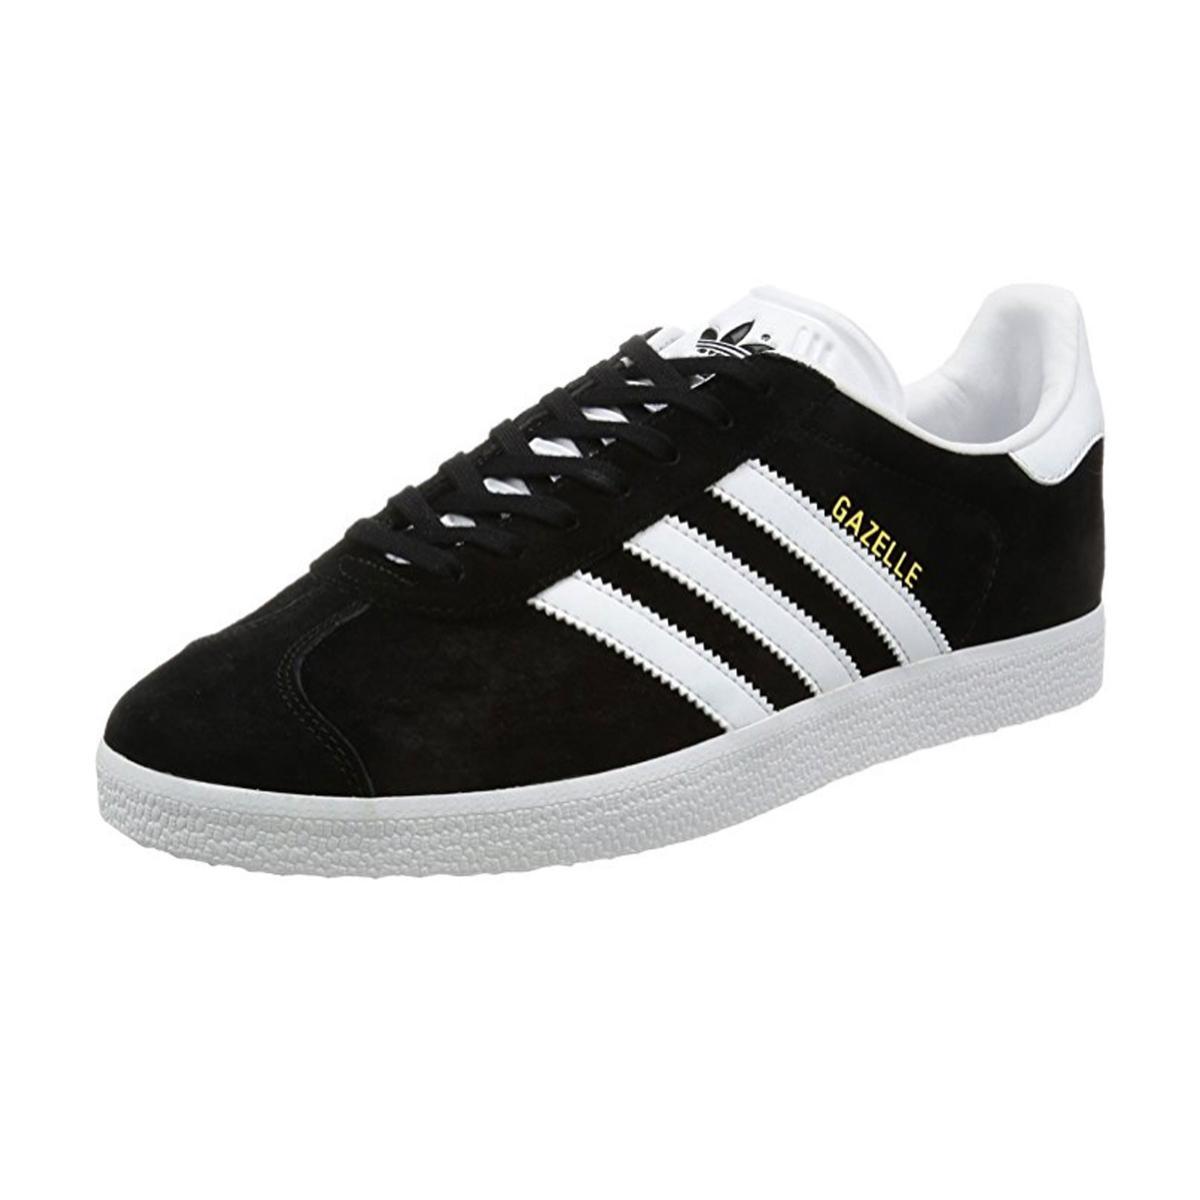 scarpe adidas gazzelle da uomo